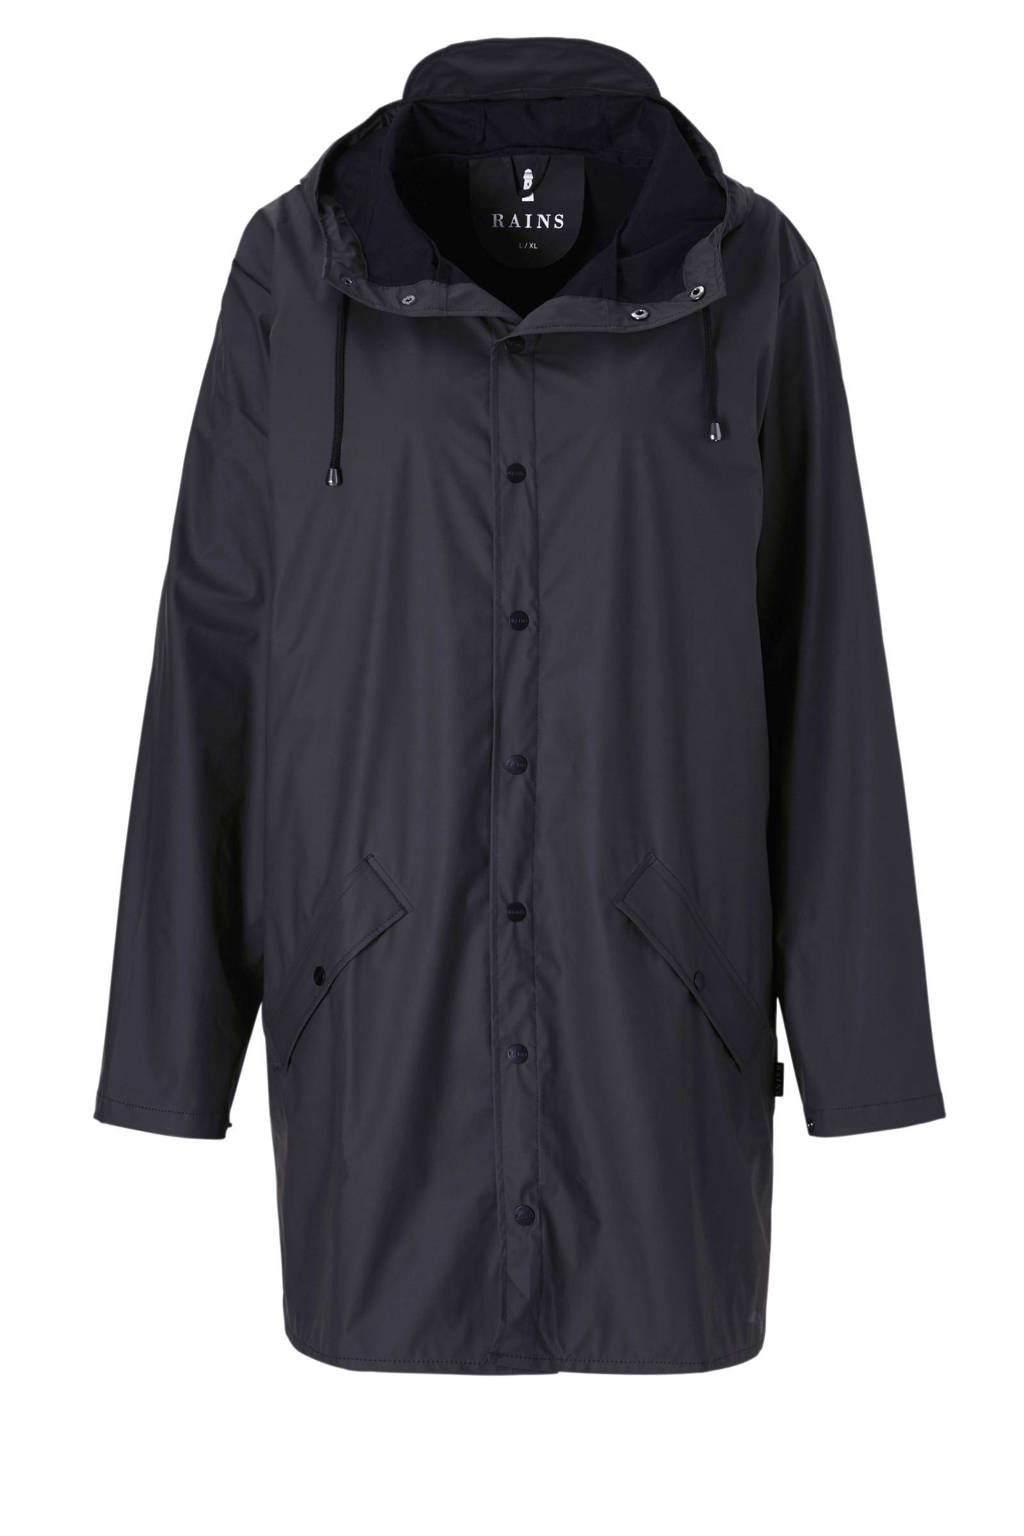 Rains Long Jacket regenjas, Donkerblauw